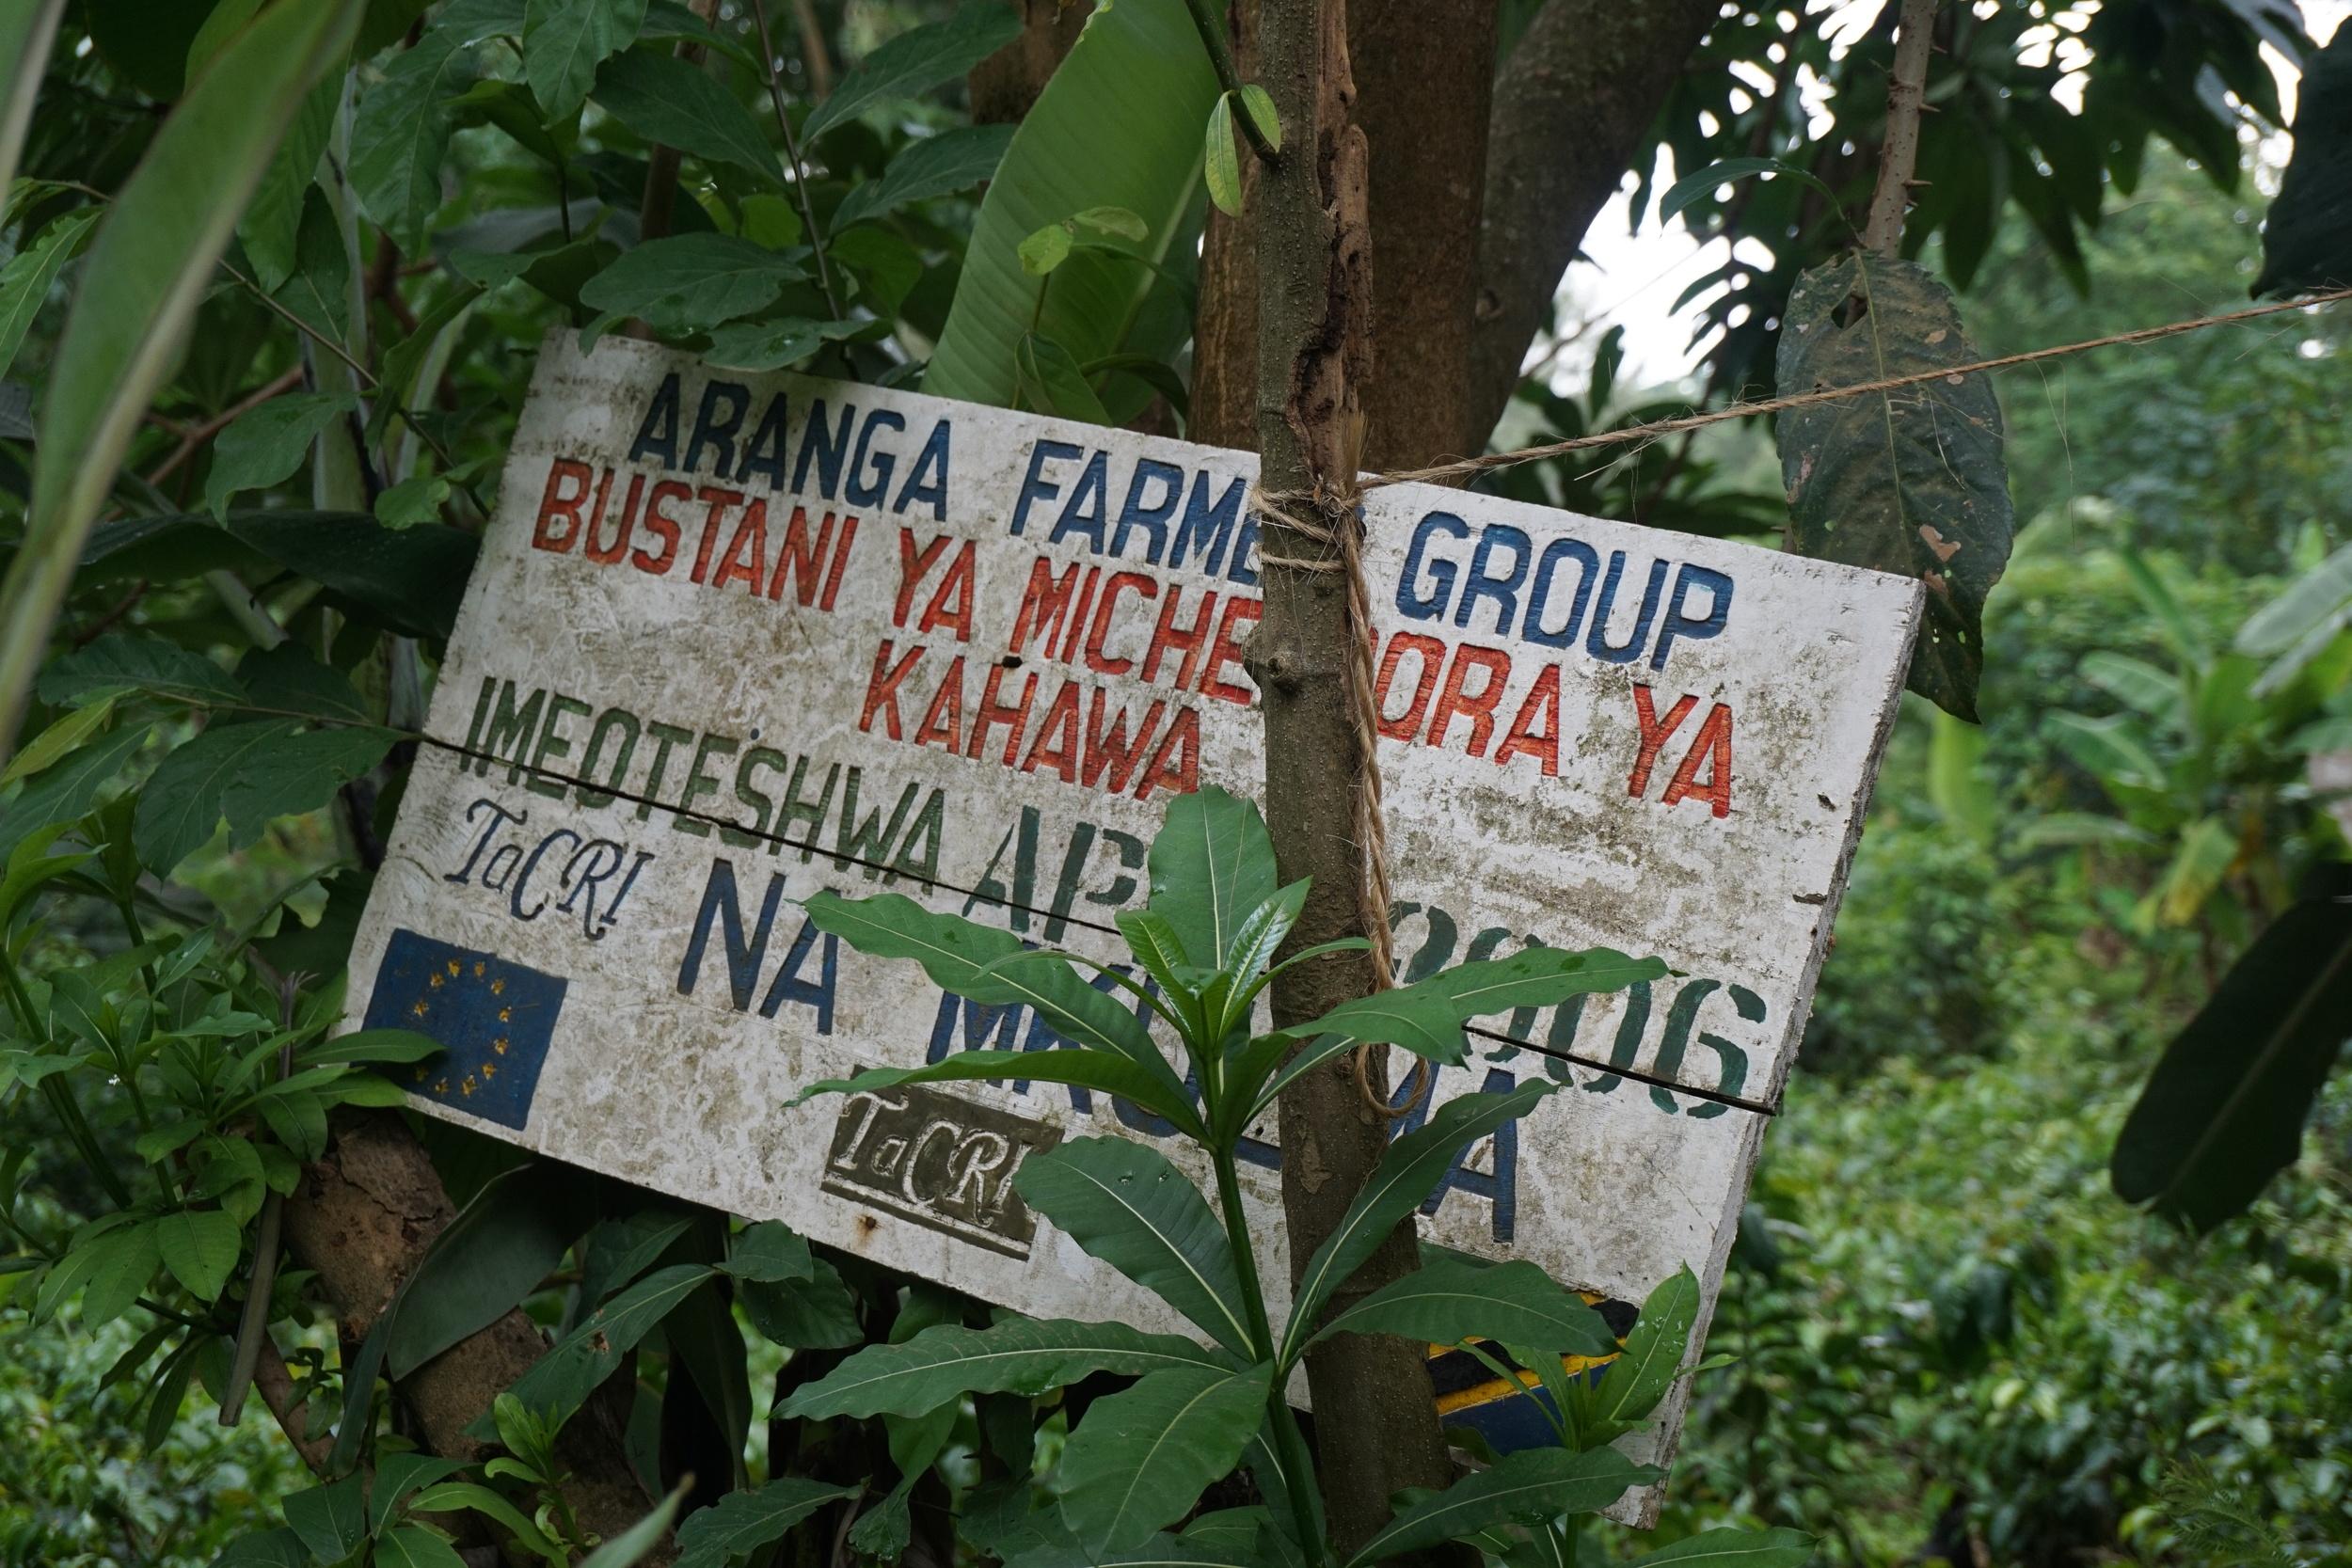 The Aranga group sign hidden in the shrubs.